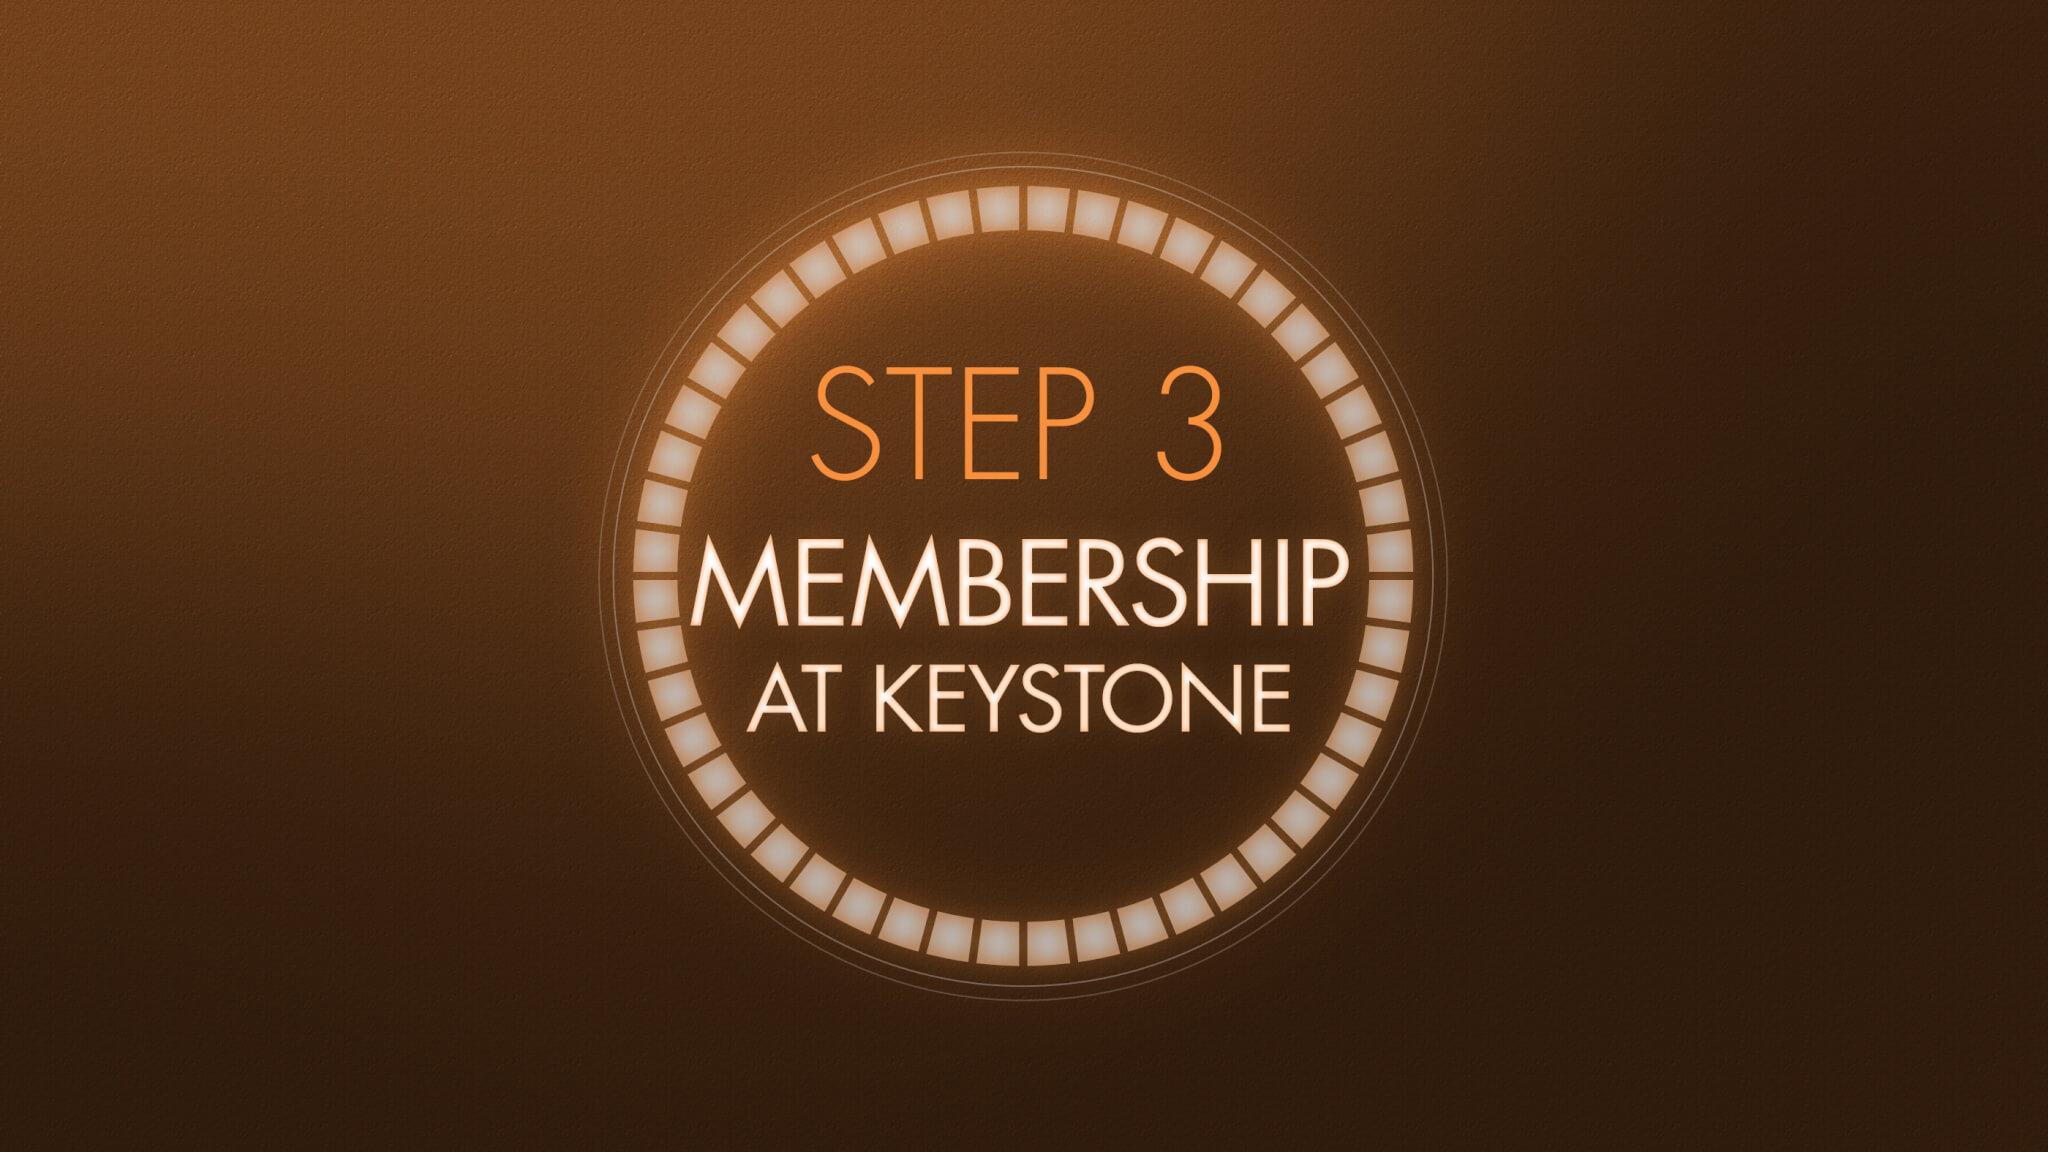 Step 3 - Membership